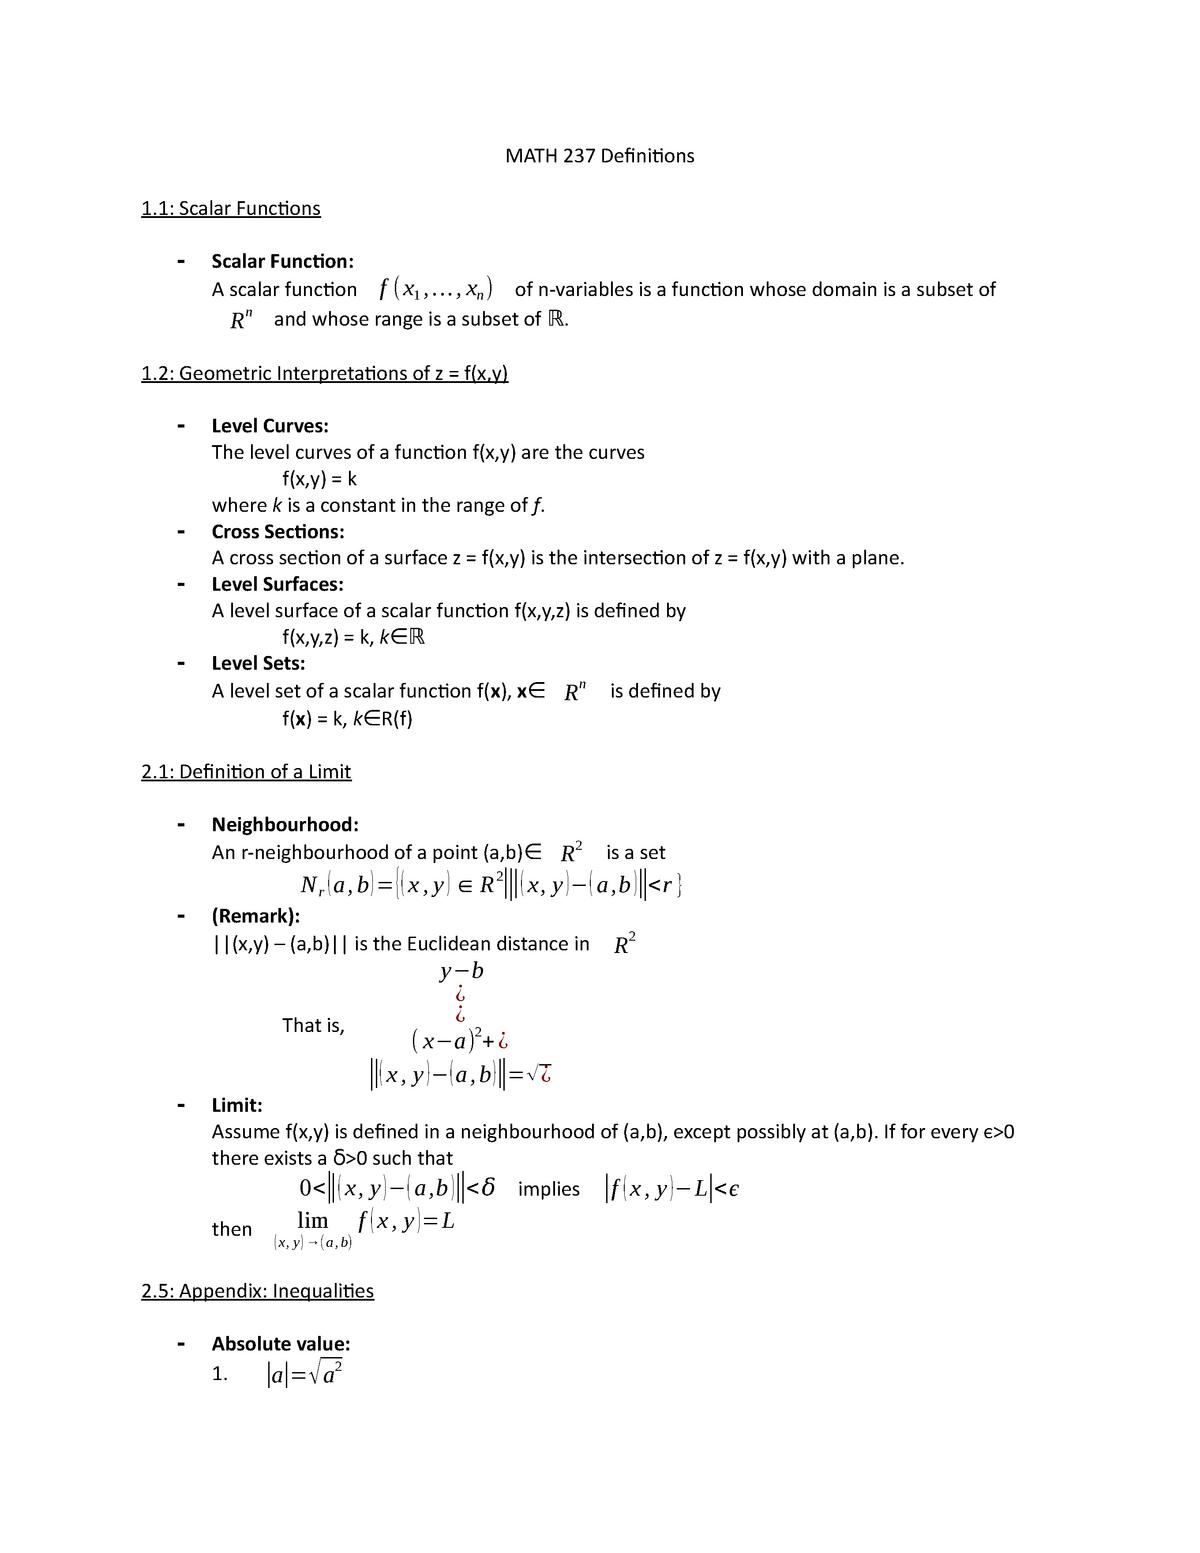 MATH 237 Definitions - Math 237 Calculus 3 for Honours Math